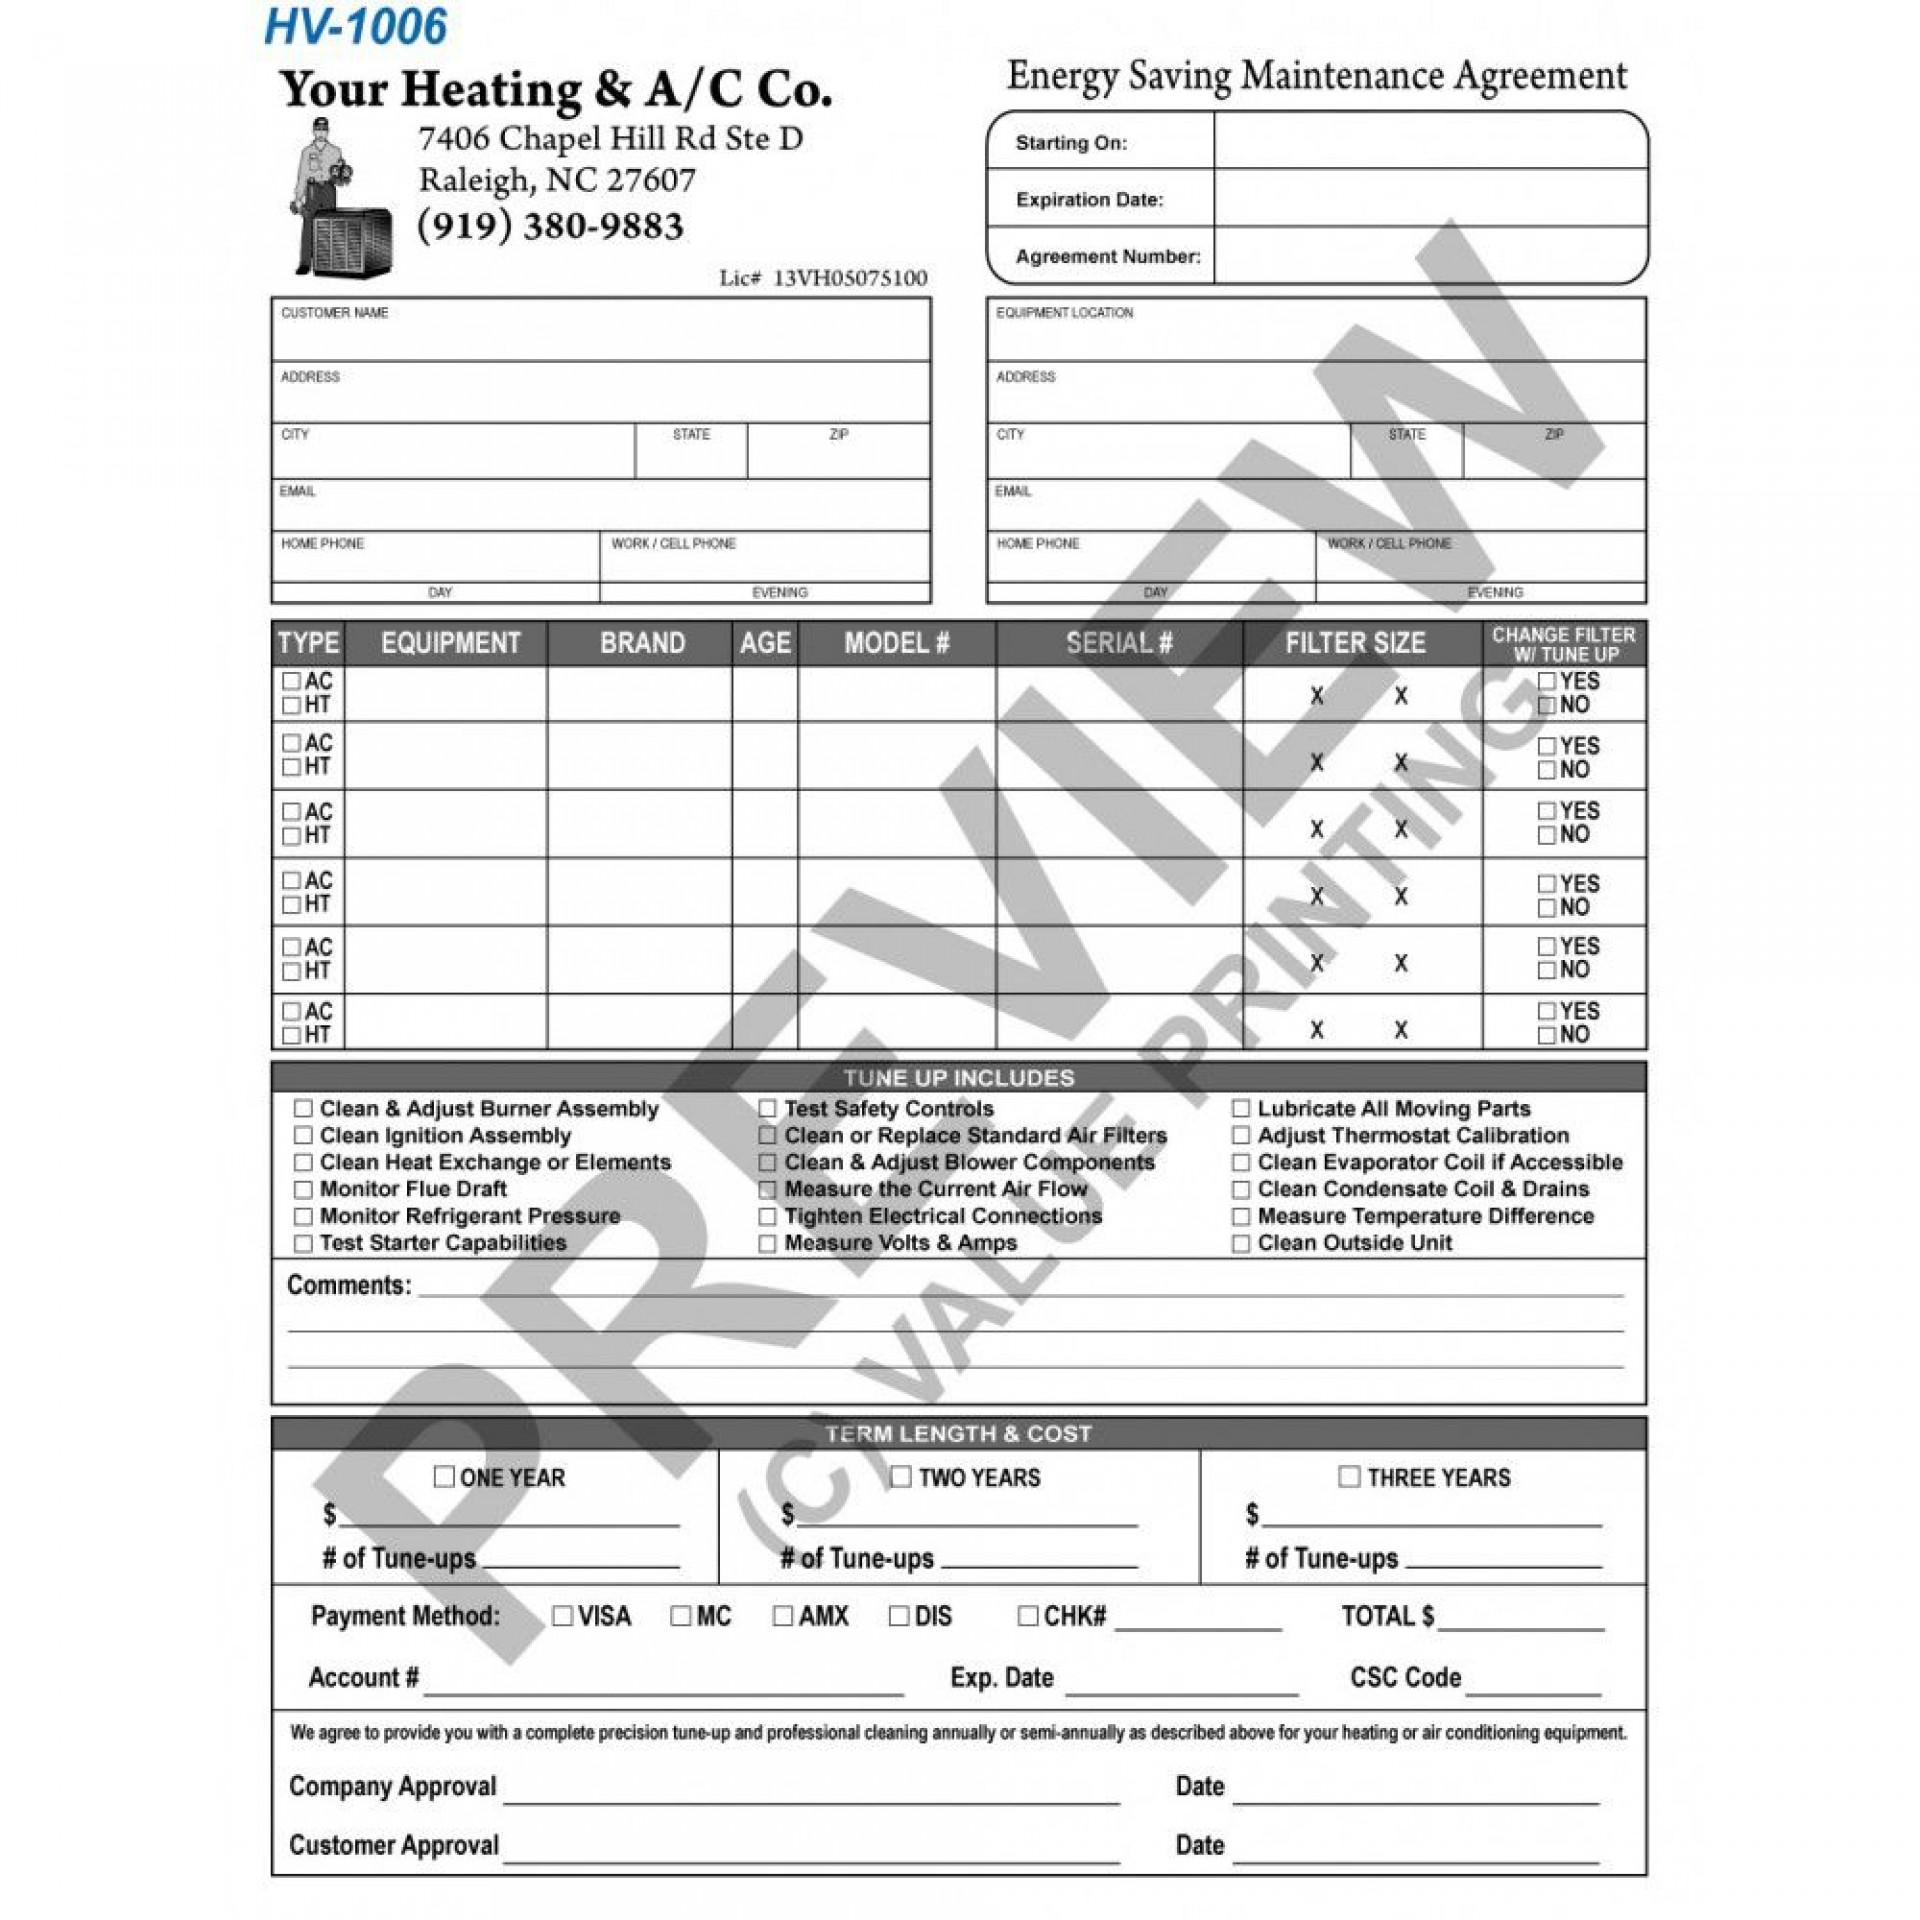 005 Best Hvac Service Agreement Template Image  Contract Form Maintenance Pdf1920